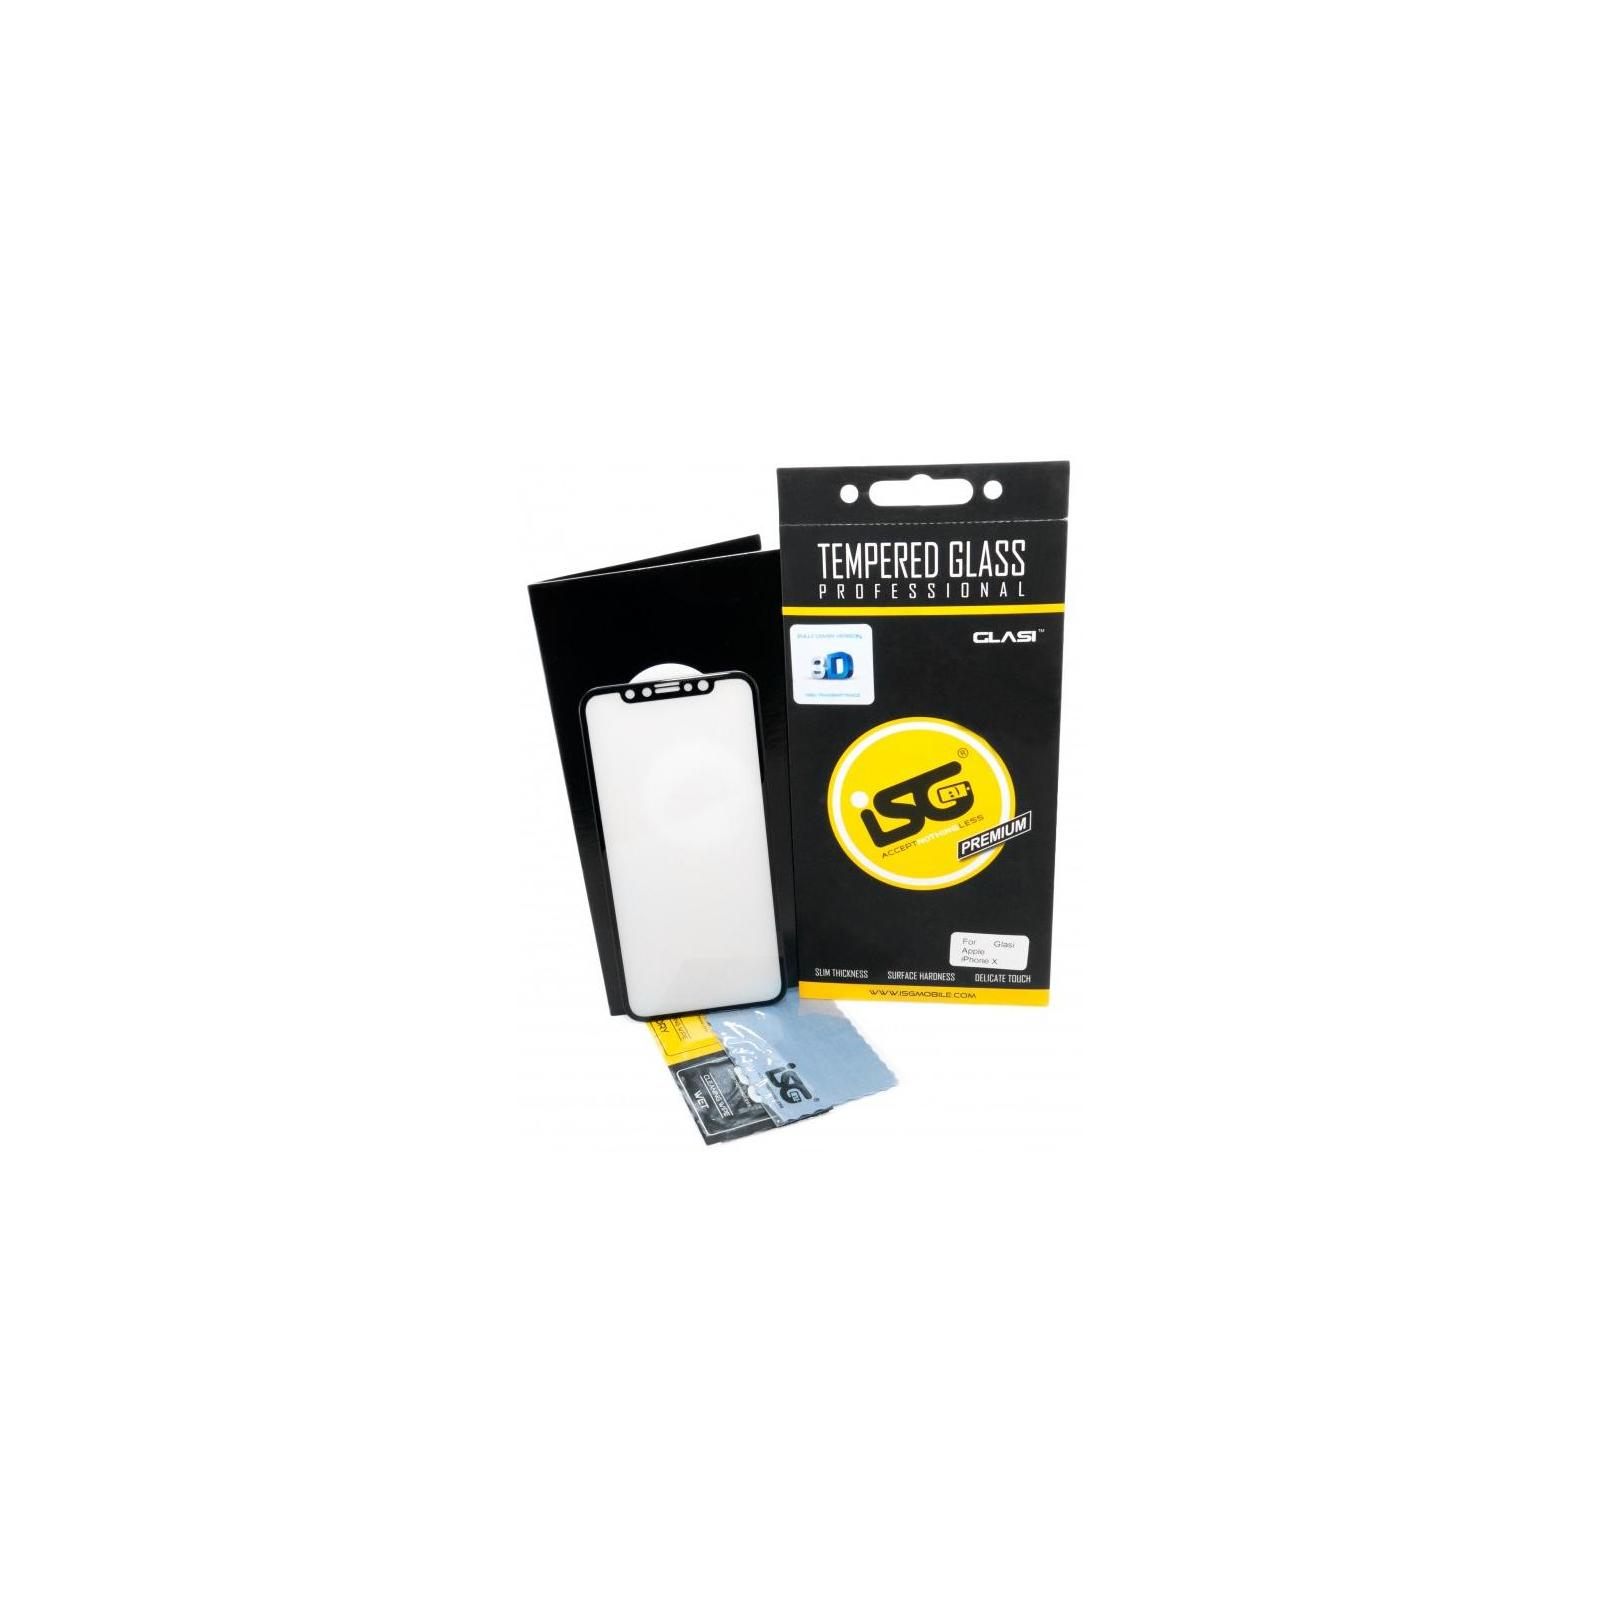 Стекло защитное iSG для Apple iPhone X 3D Full Cover Black (SPG4407)